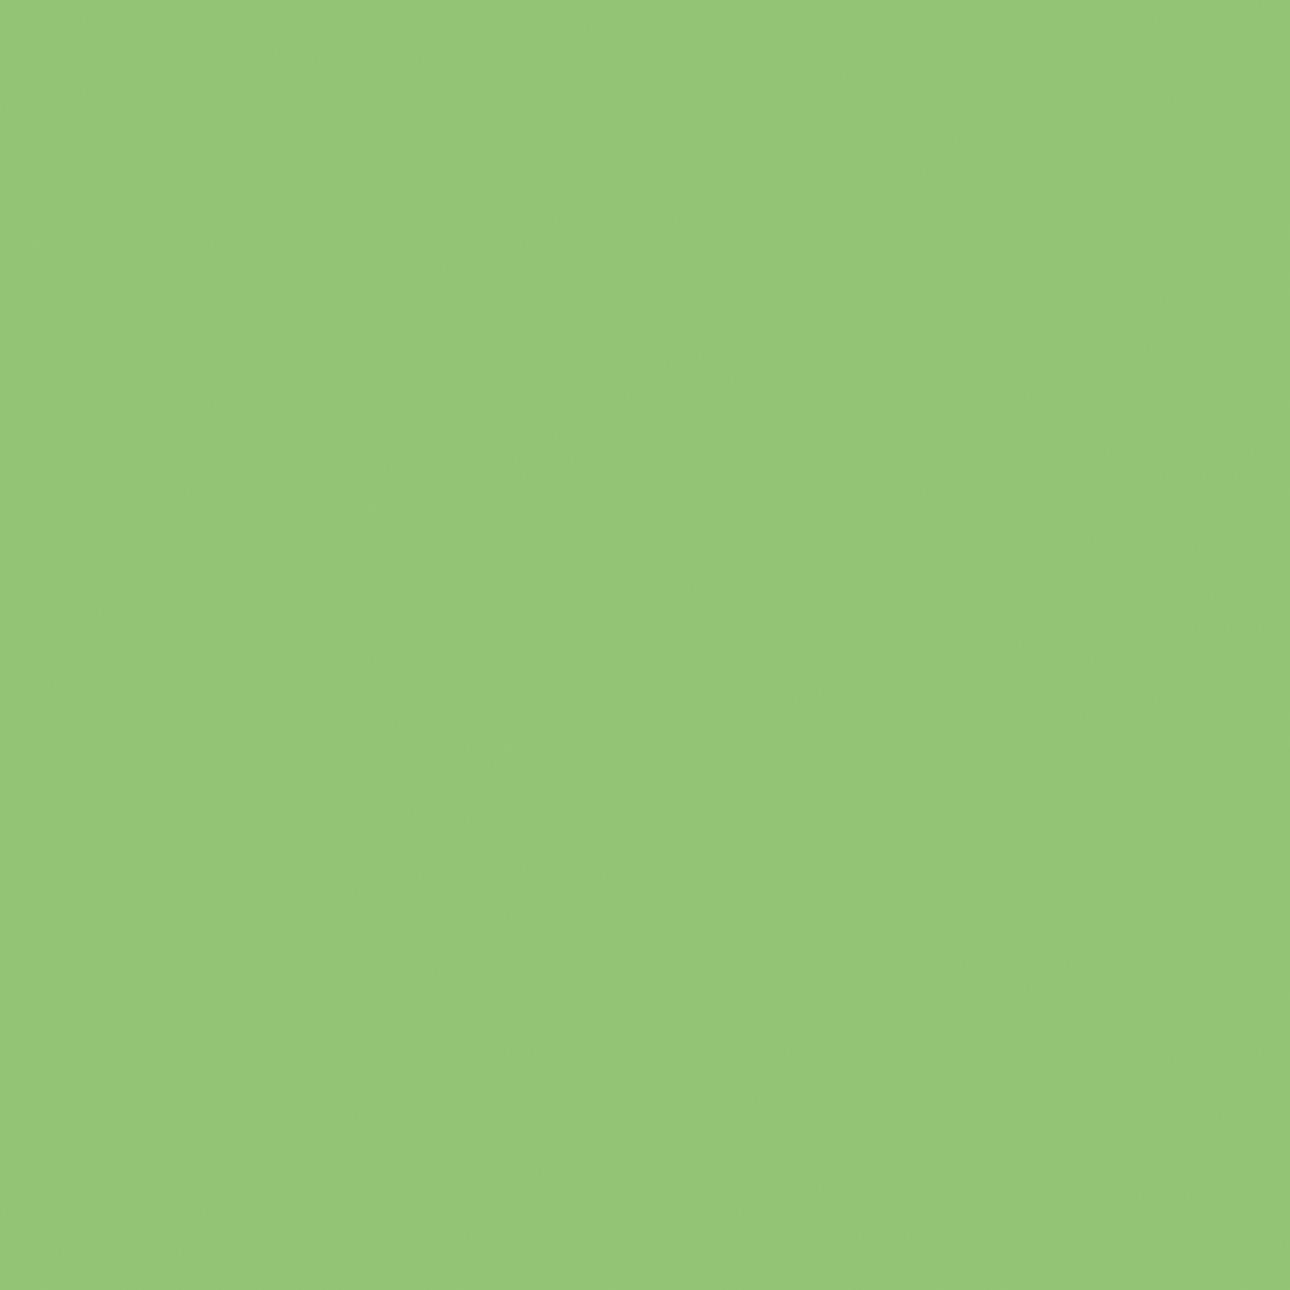 Apfelgrün